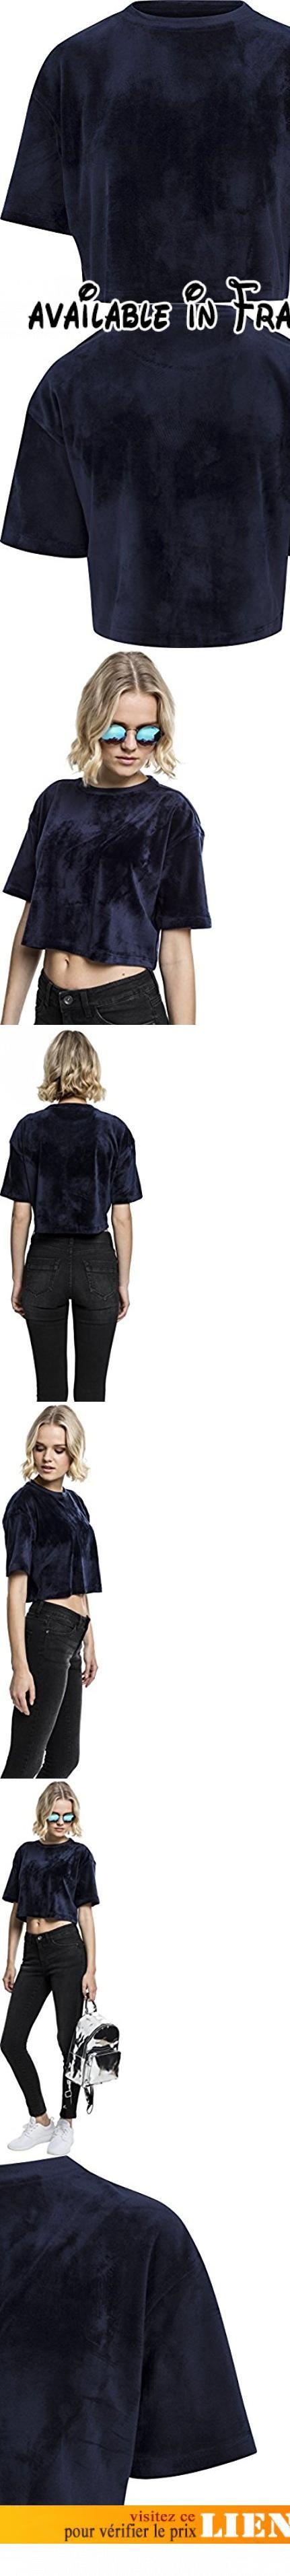 Urban Classics Ladies Velvet Short Kimono Tee, T-Shirt Femme, Blau (Navy 155), Medium. Urban Classics T-shirt Femme Ladies Velvet Short Kimono Tee pour Femme. marine. 93% Polyester, 7% Élasthanne. Coupe standard #Apparel #SHIRT